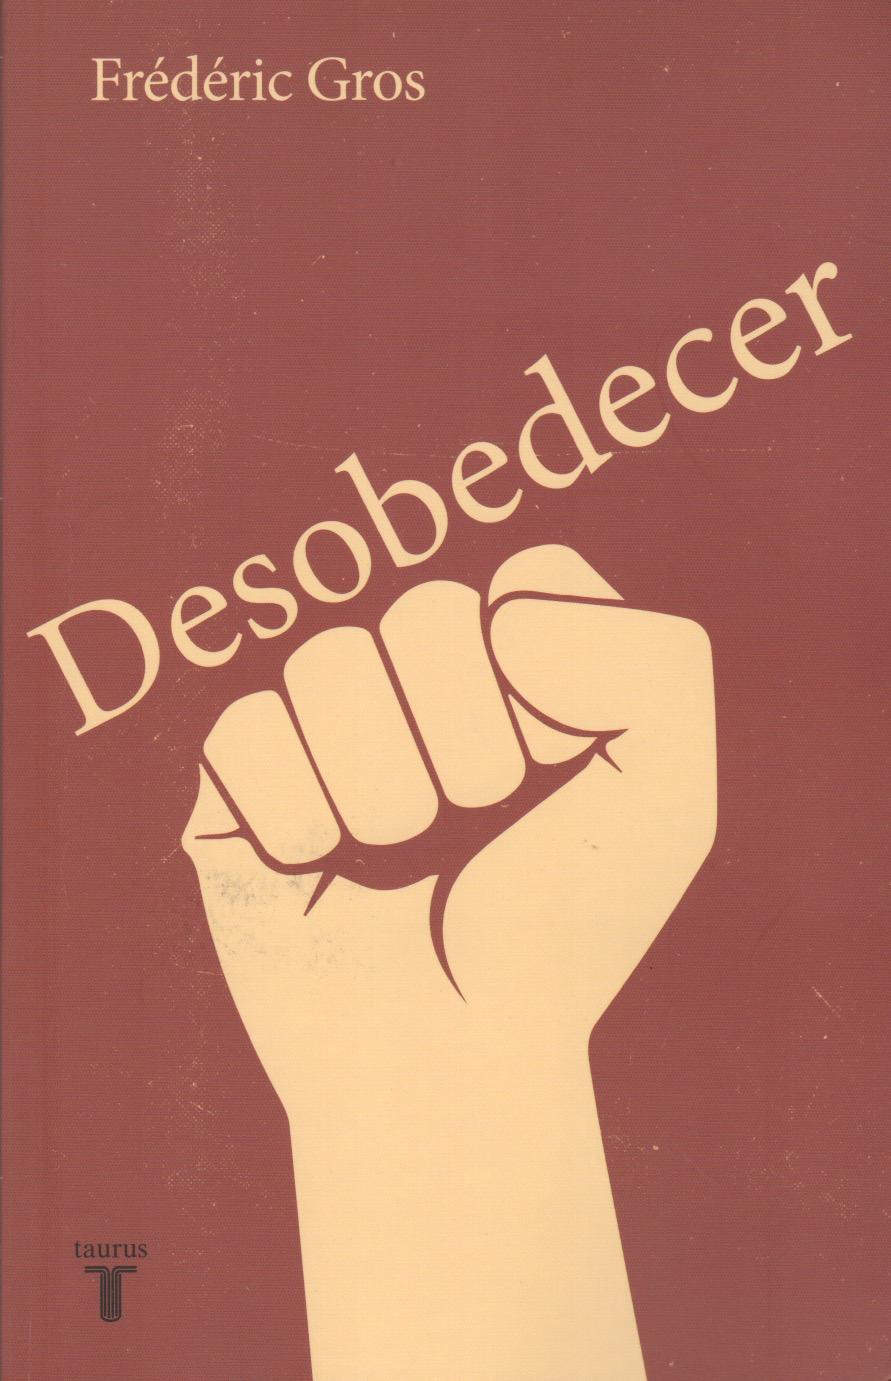 Fréderic Gros (Desobedecer)